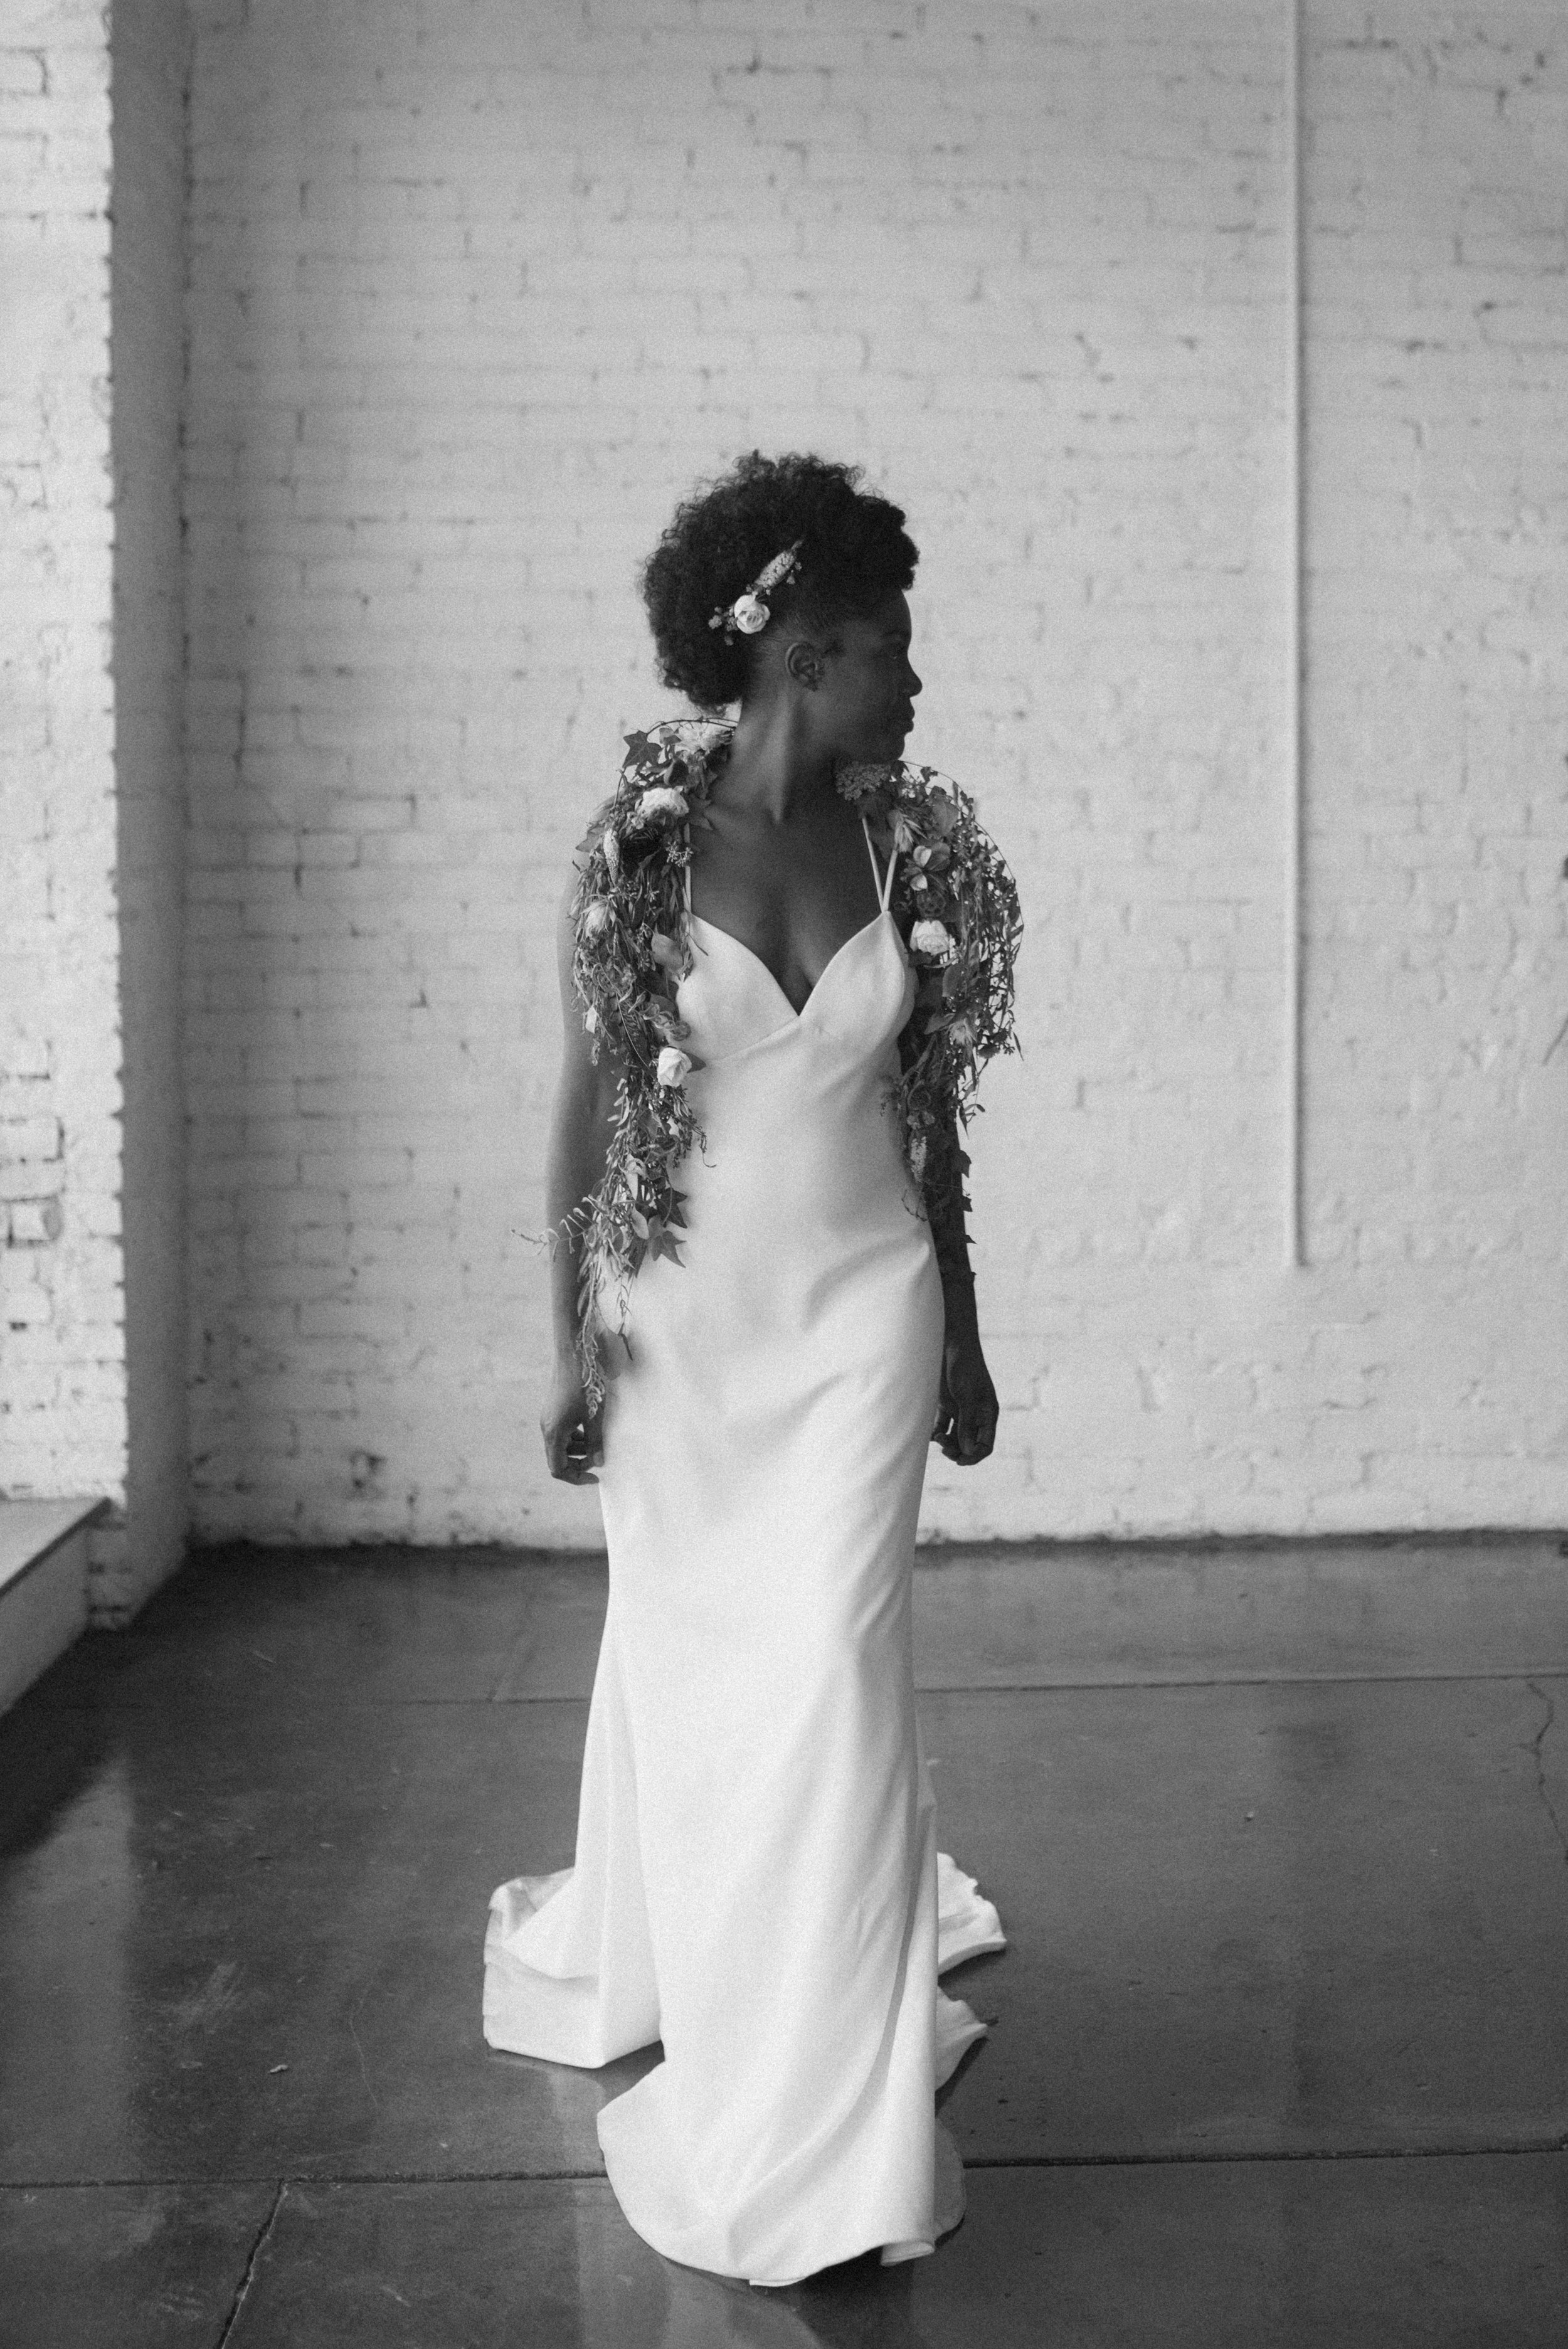 haus-820-minimal-editorial-wedding-styled-shoot-82.jpg